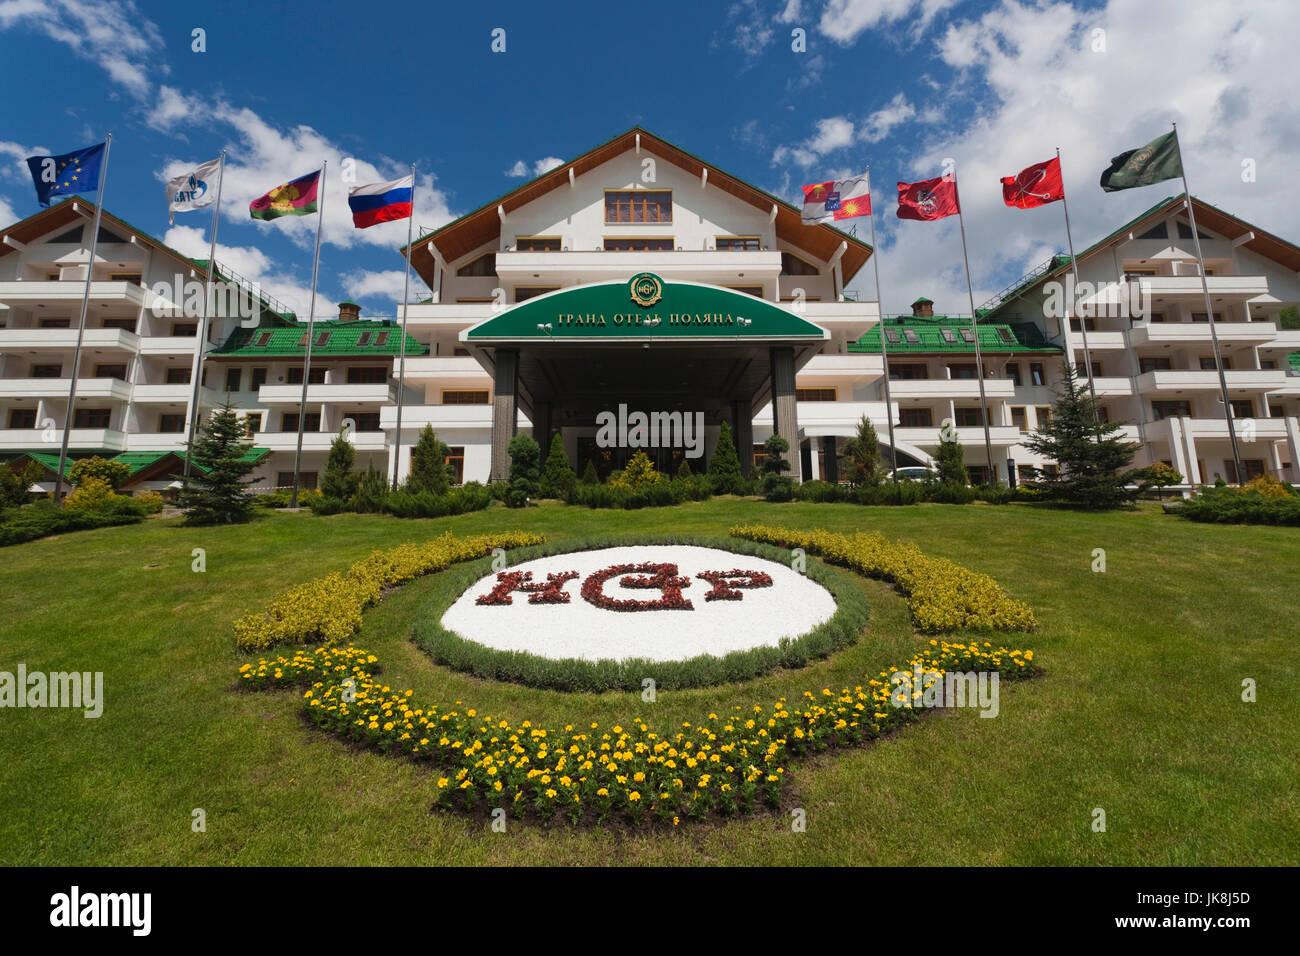 Russia, Caucasus Mountains, Sochi Area, Krasnaya Polyana, Gazprom Ski Resort, Grand Hotel Polyana, exterior, summer - Stock Image